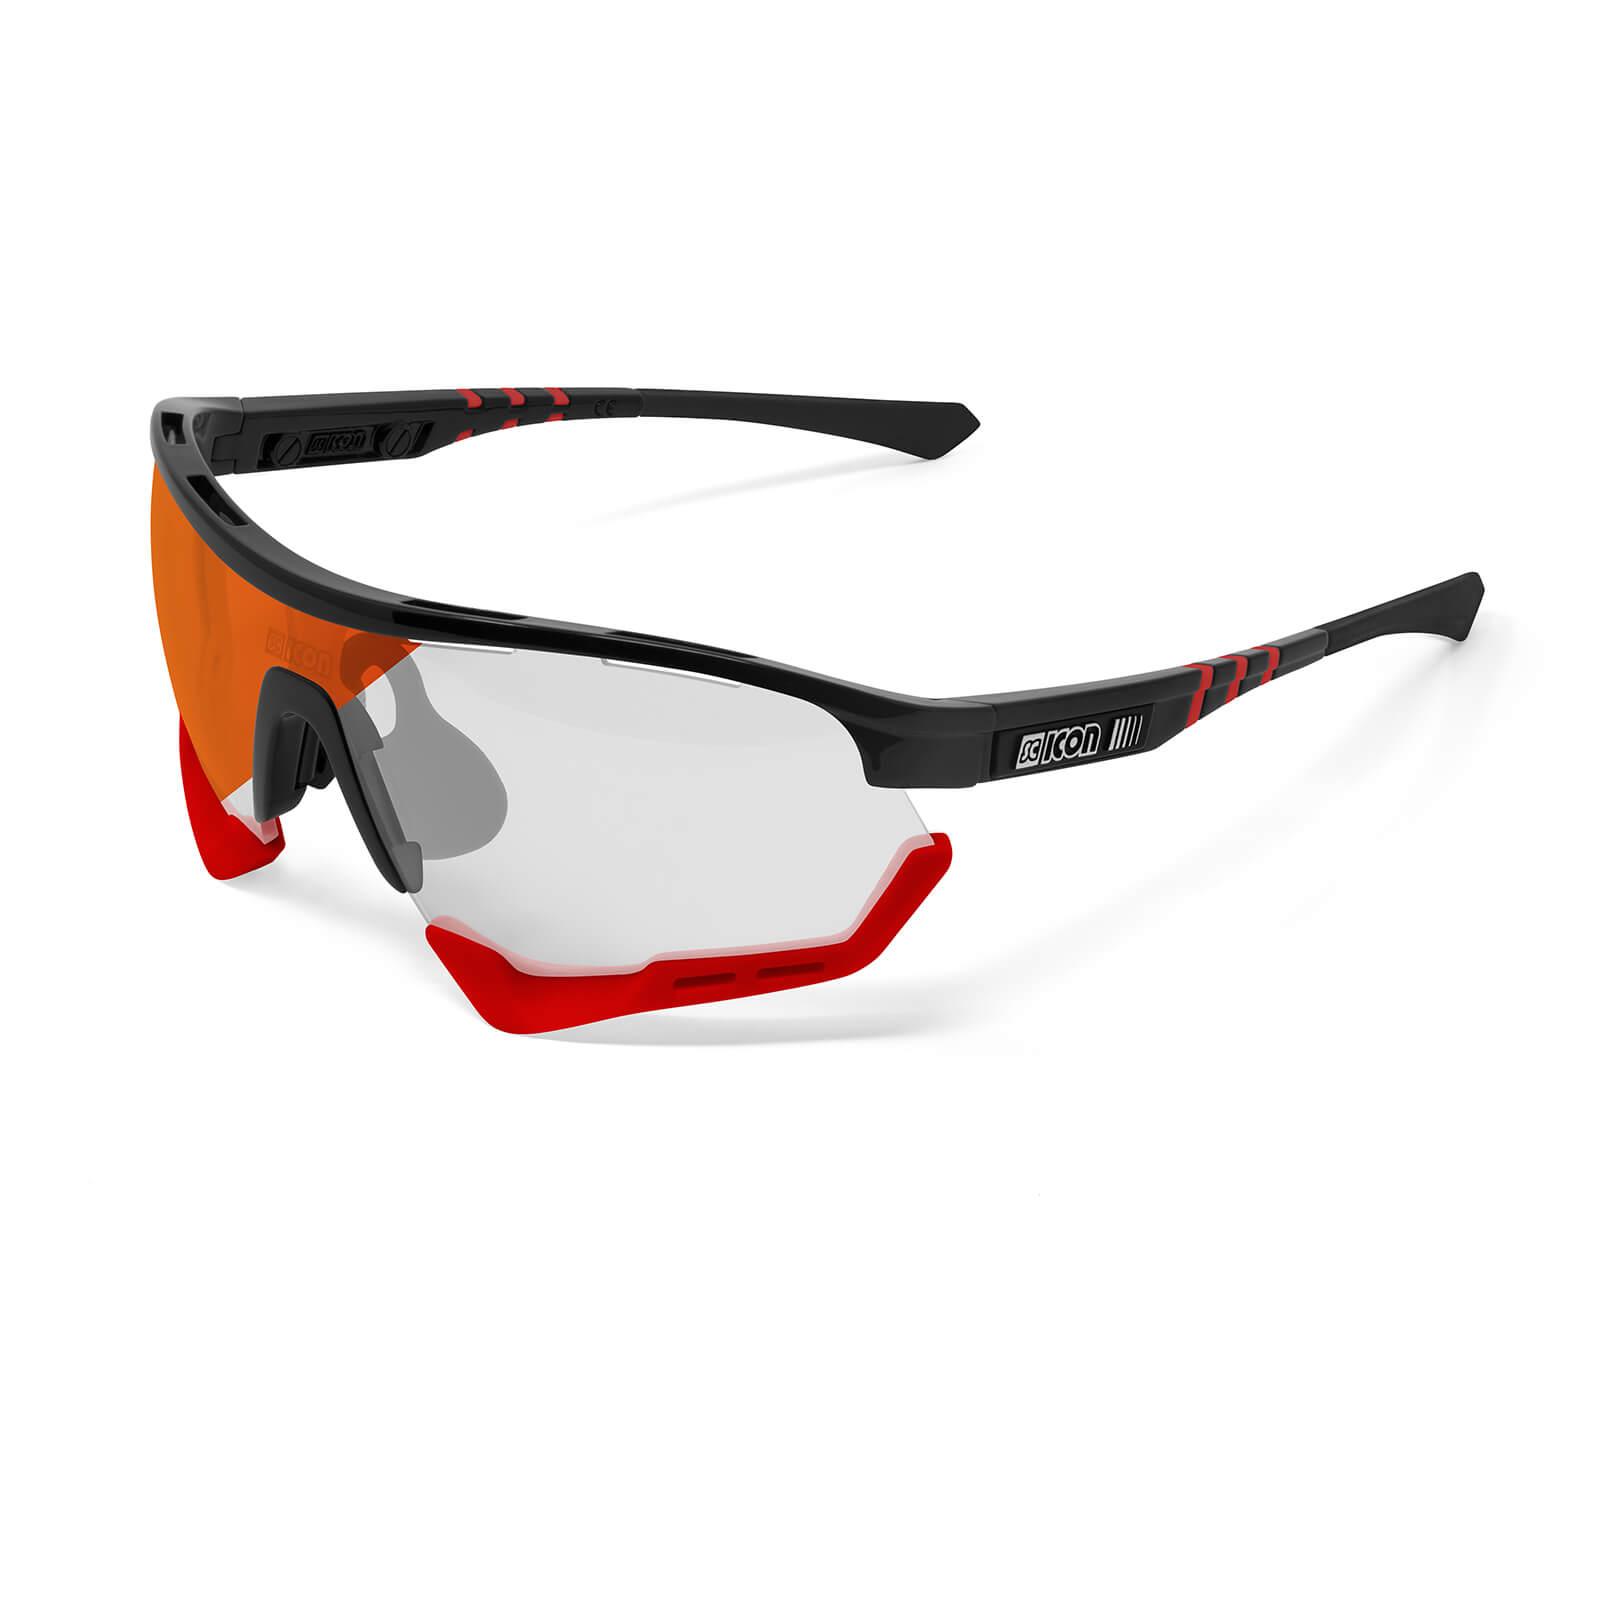 Scicon Aerotech XL Sunglasses Black Gloss/SCN-XT Photochromic Red Mirror